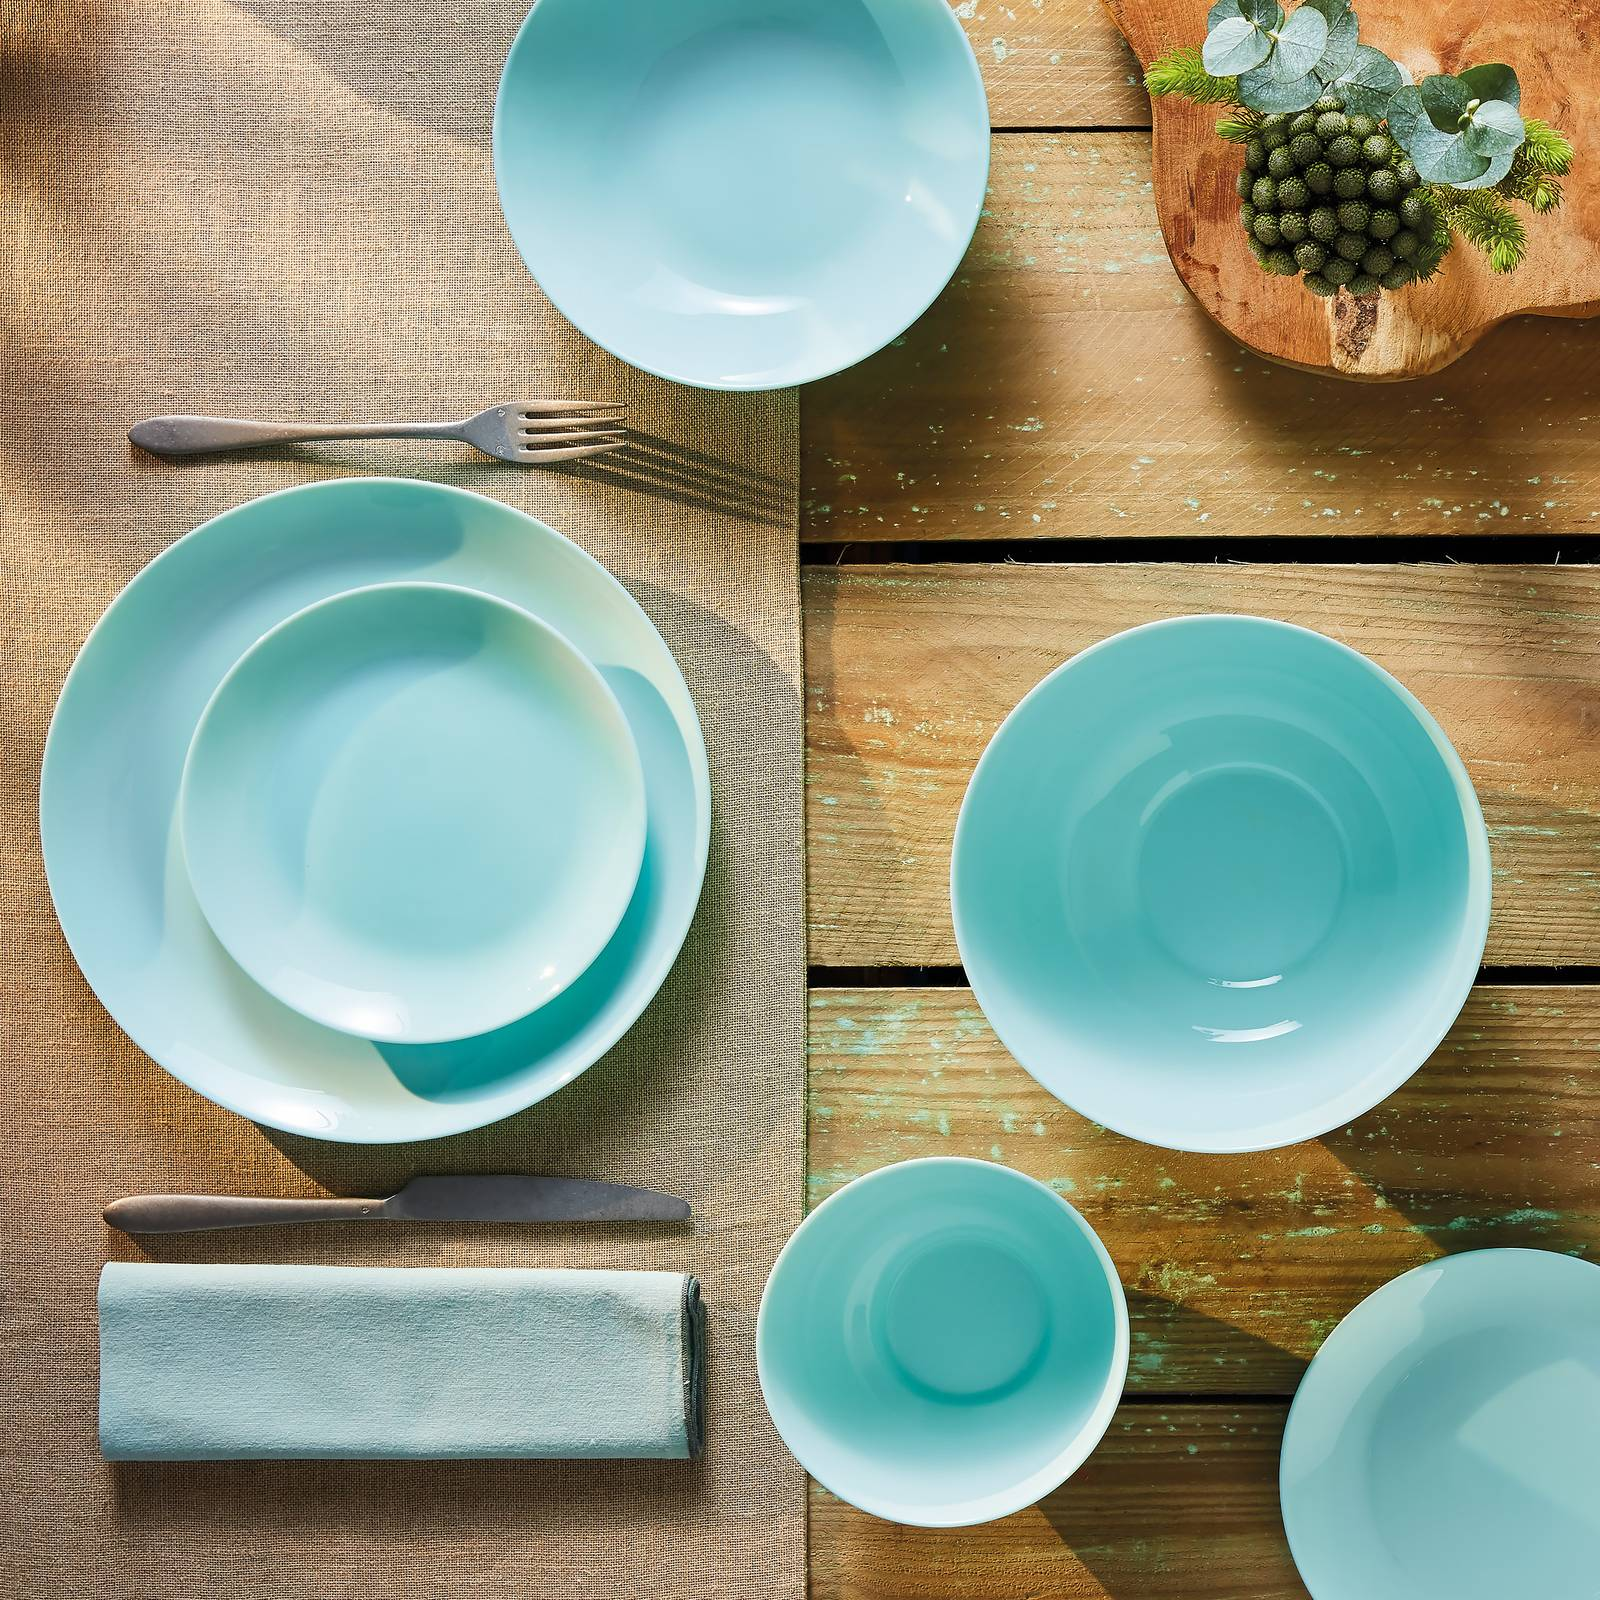 Komplet obiadowy Diwali Light Turquoise 19-elementowy LUMINARC